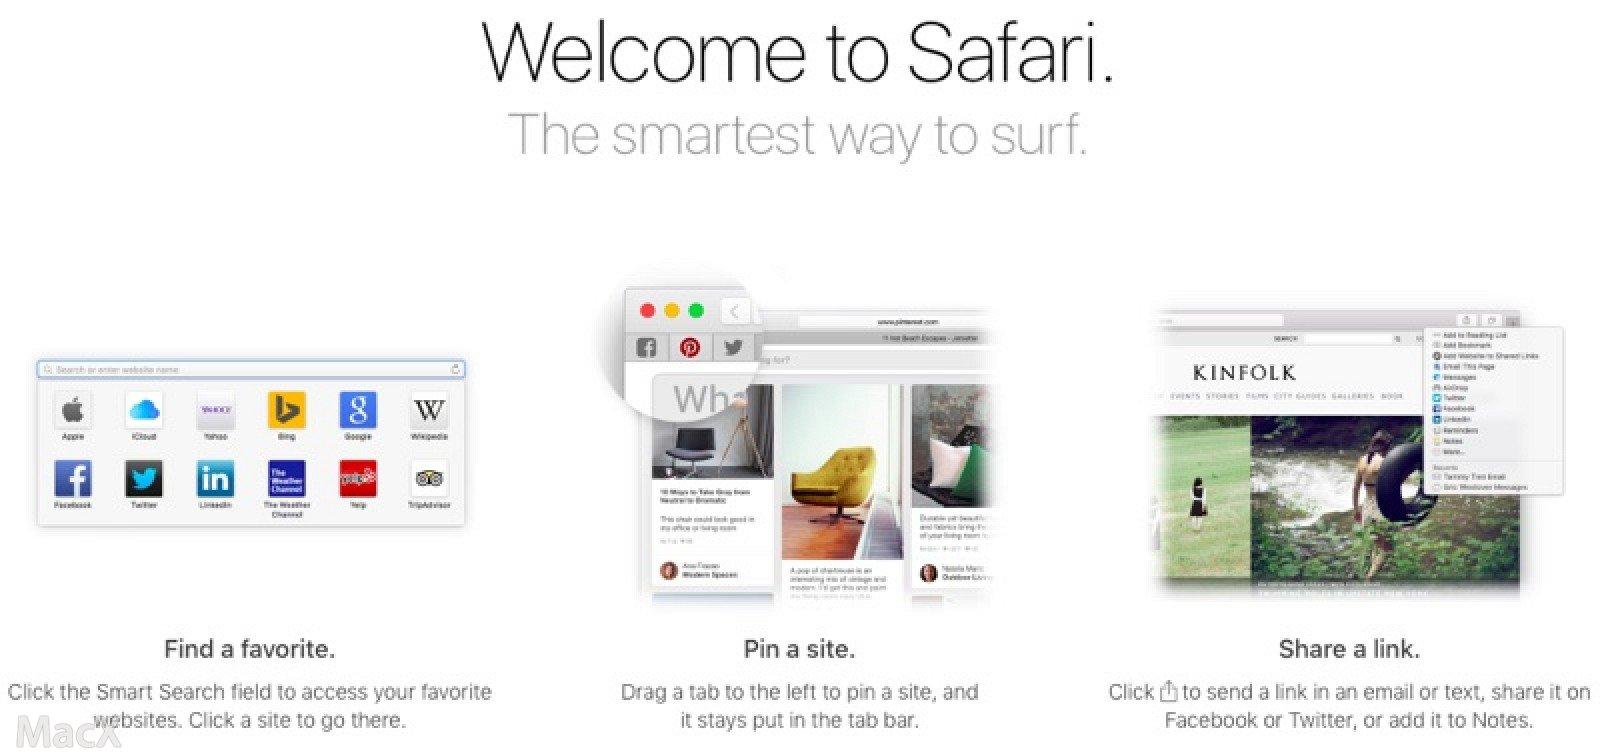 OS3 苹果发布 OS X El Capitan 第五个公测版